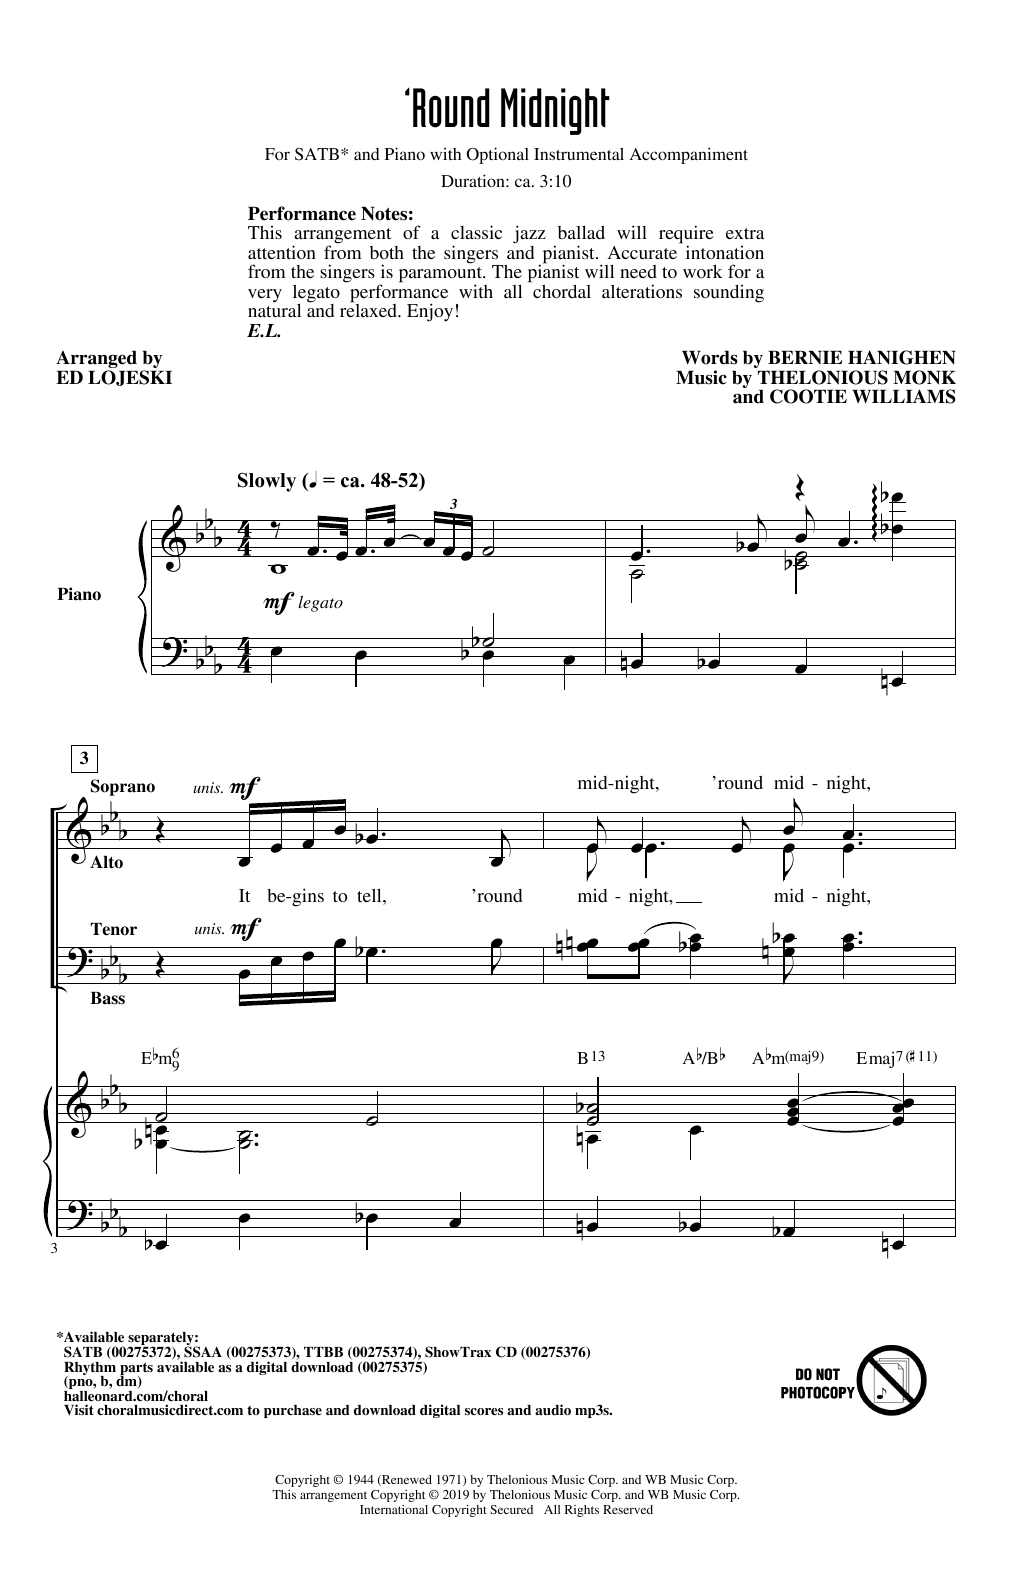 'Round Midnight (arr. Ed Lojeski) (SATB Choir)